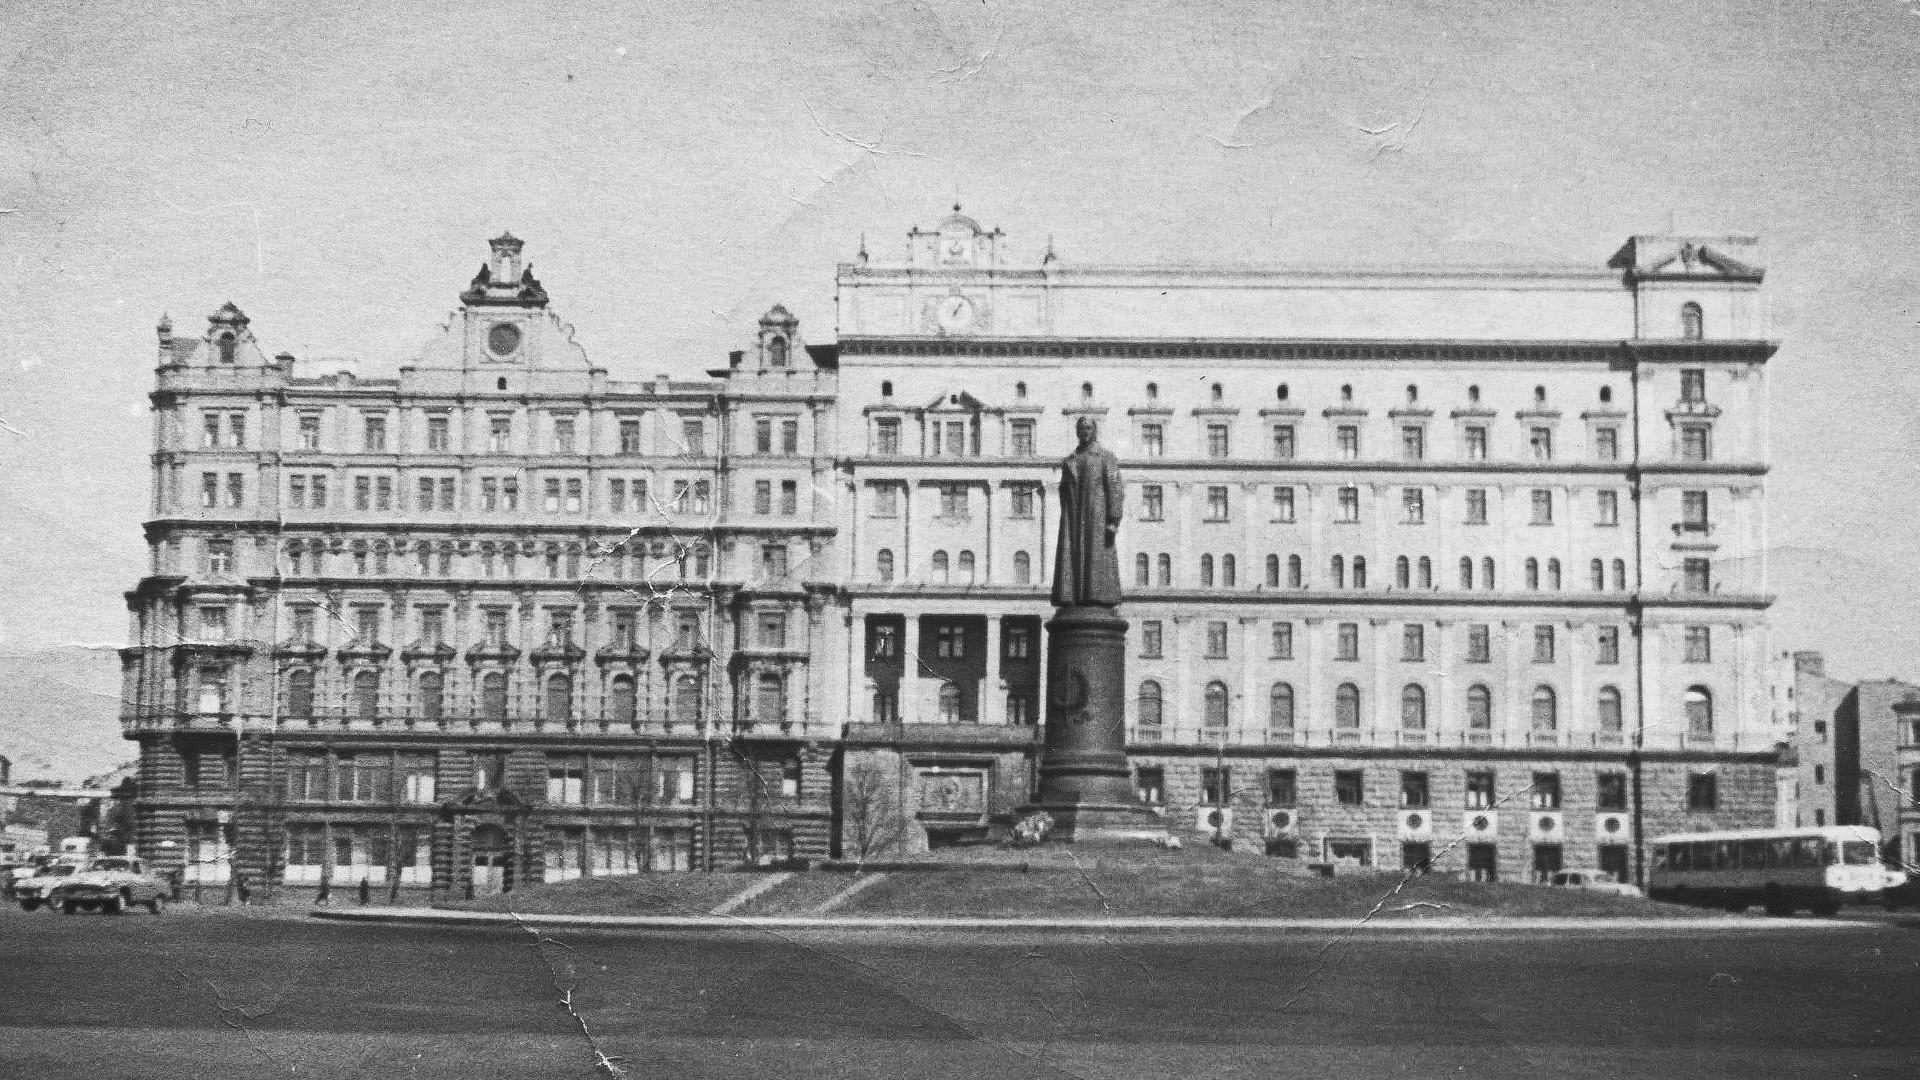 Lubjanka. Glavno poslopje sovjetske tajne službe Čeka (kasneke NKVD, kasneje KGB)